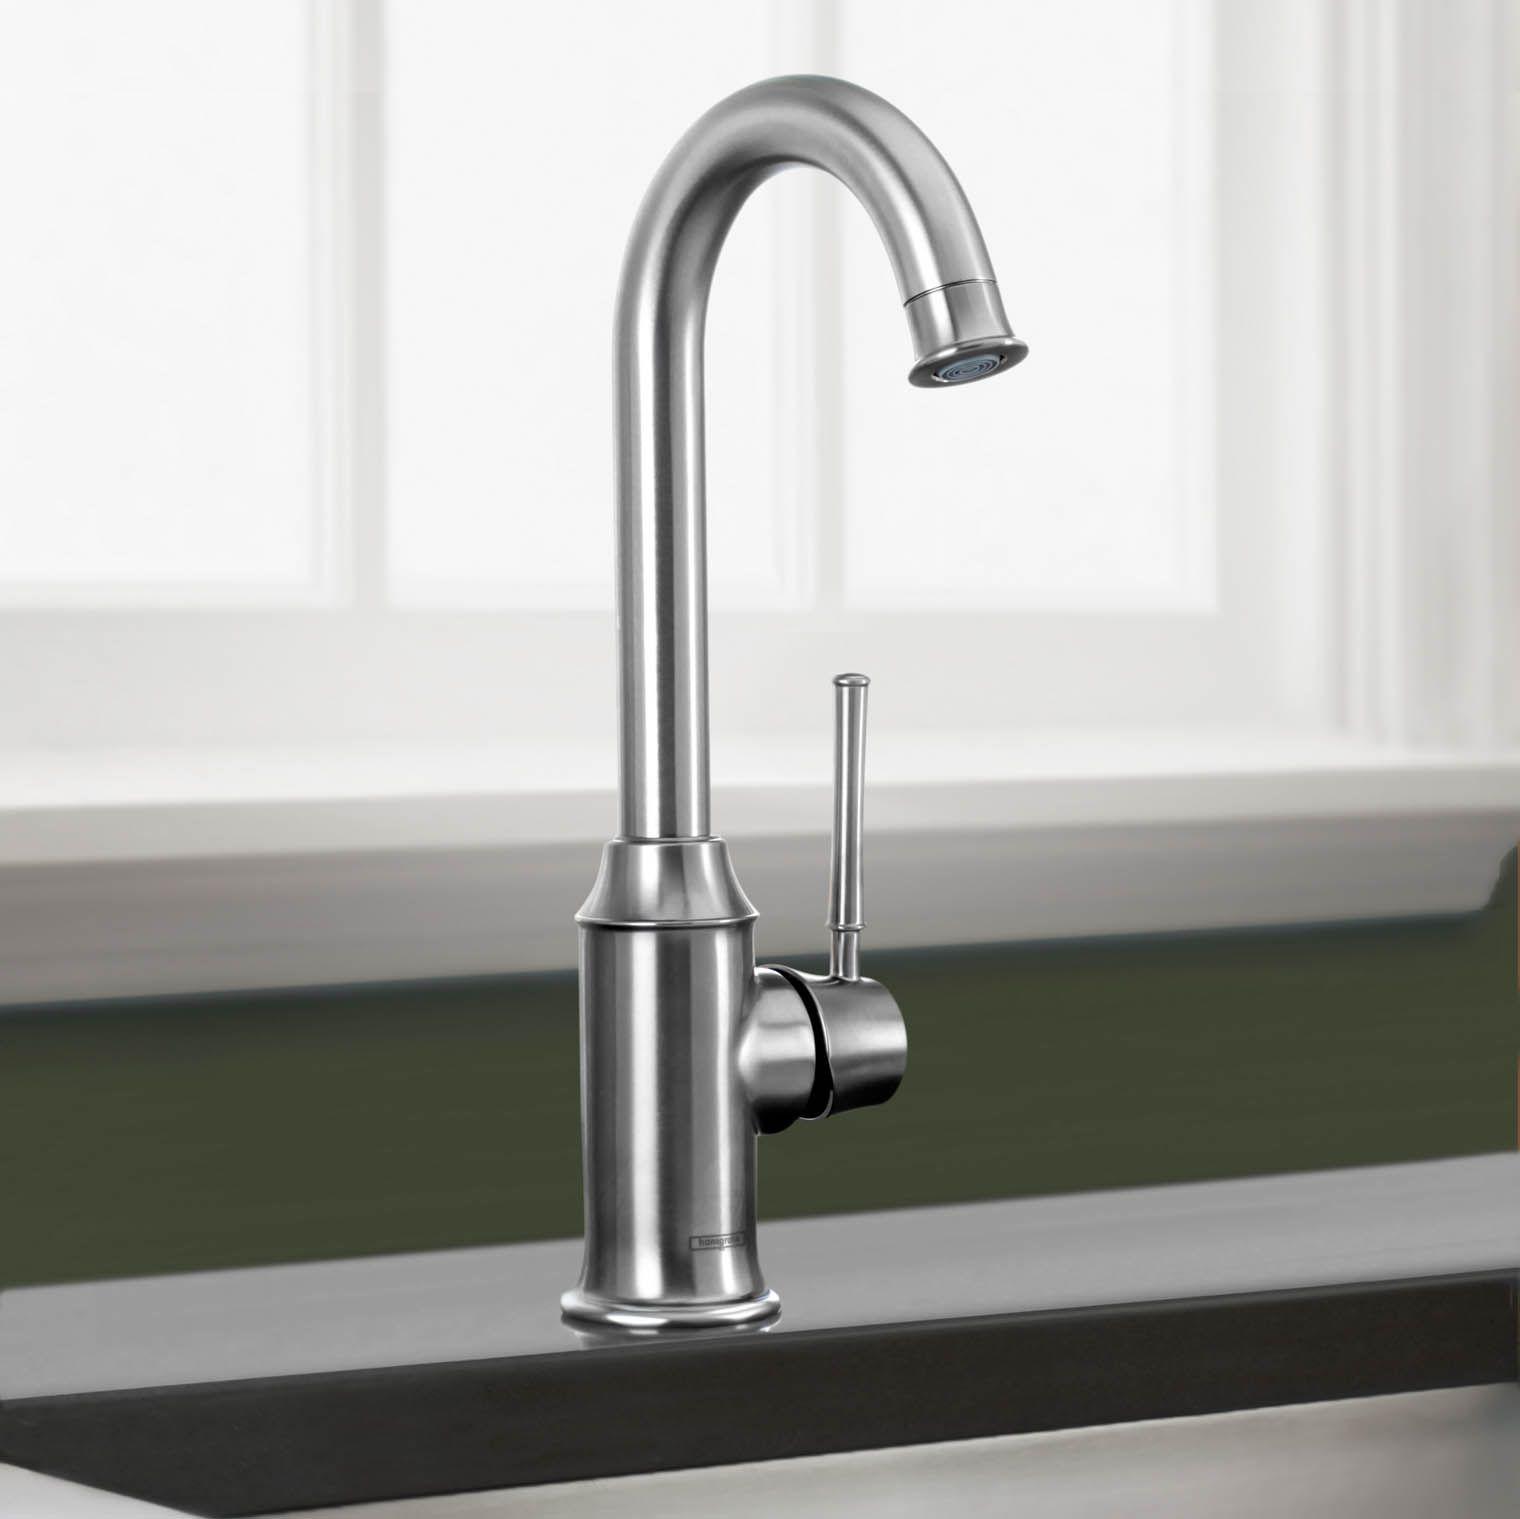 Talis C Single Handle Bar Faucet | Faucet, Bar and Bar faucets